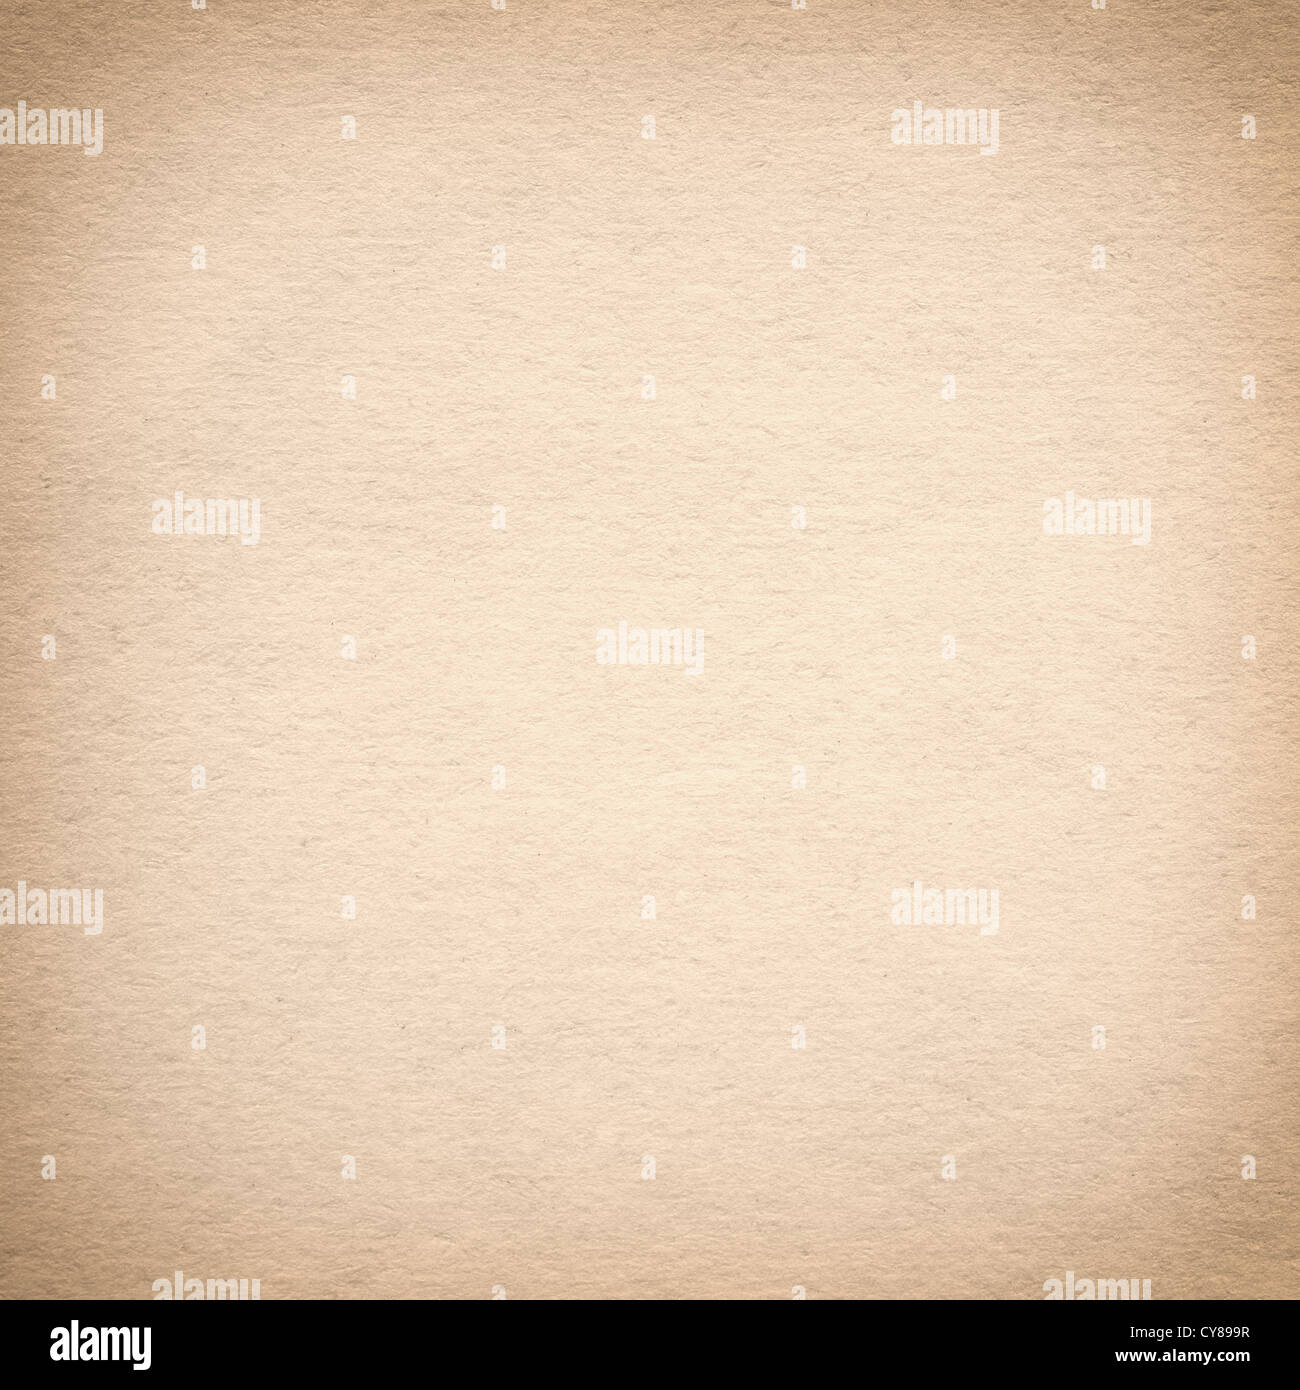 Blank Plain Scrapbook Brown Paper Stock Photos Blank Plain